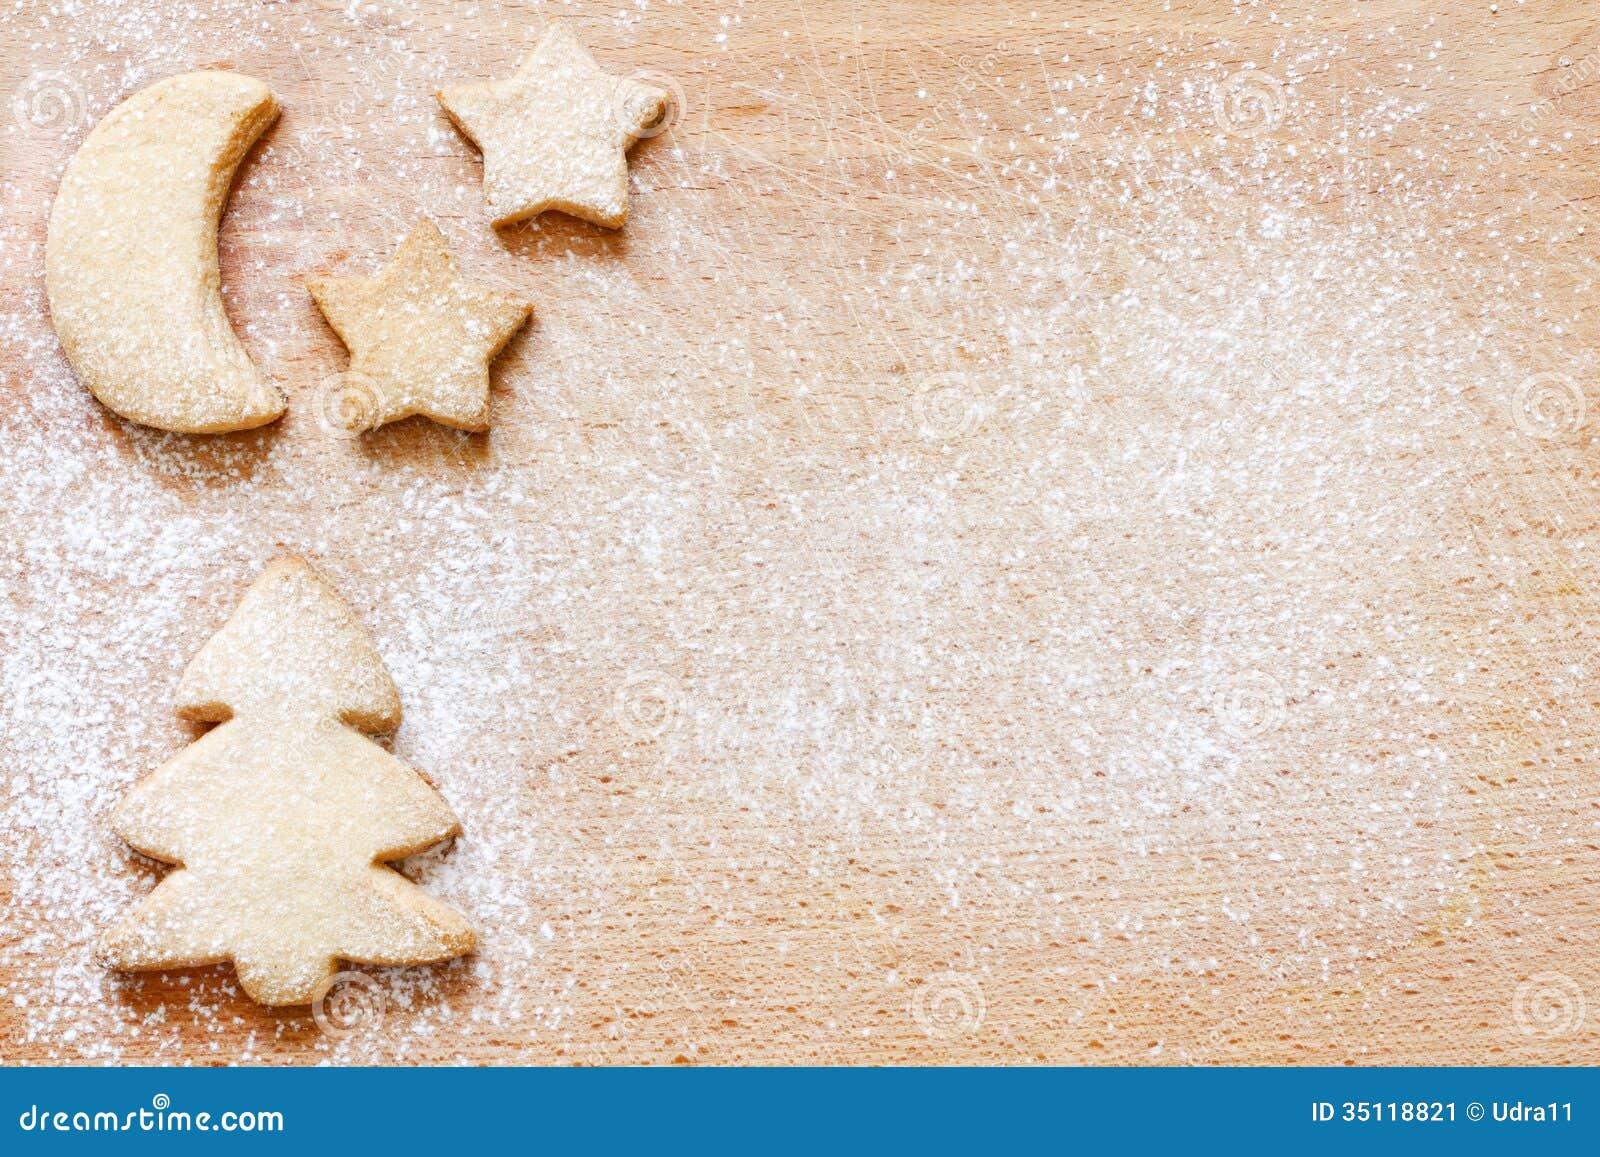 christmas baking background with - photo #4